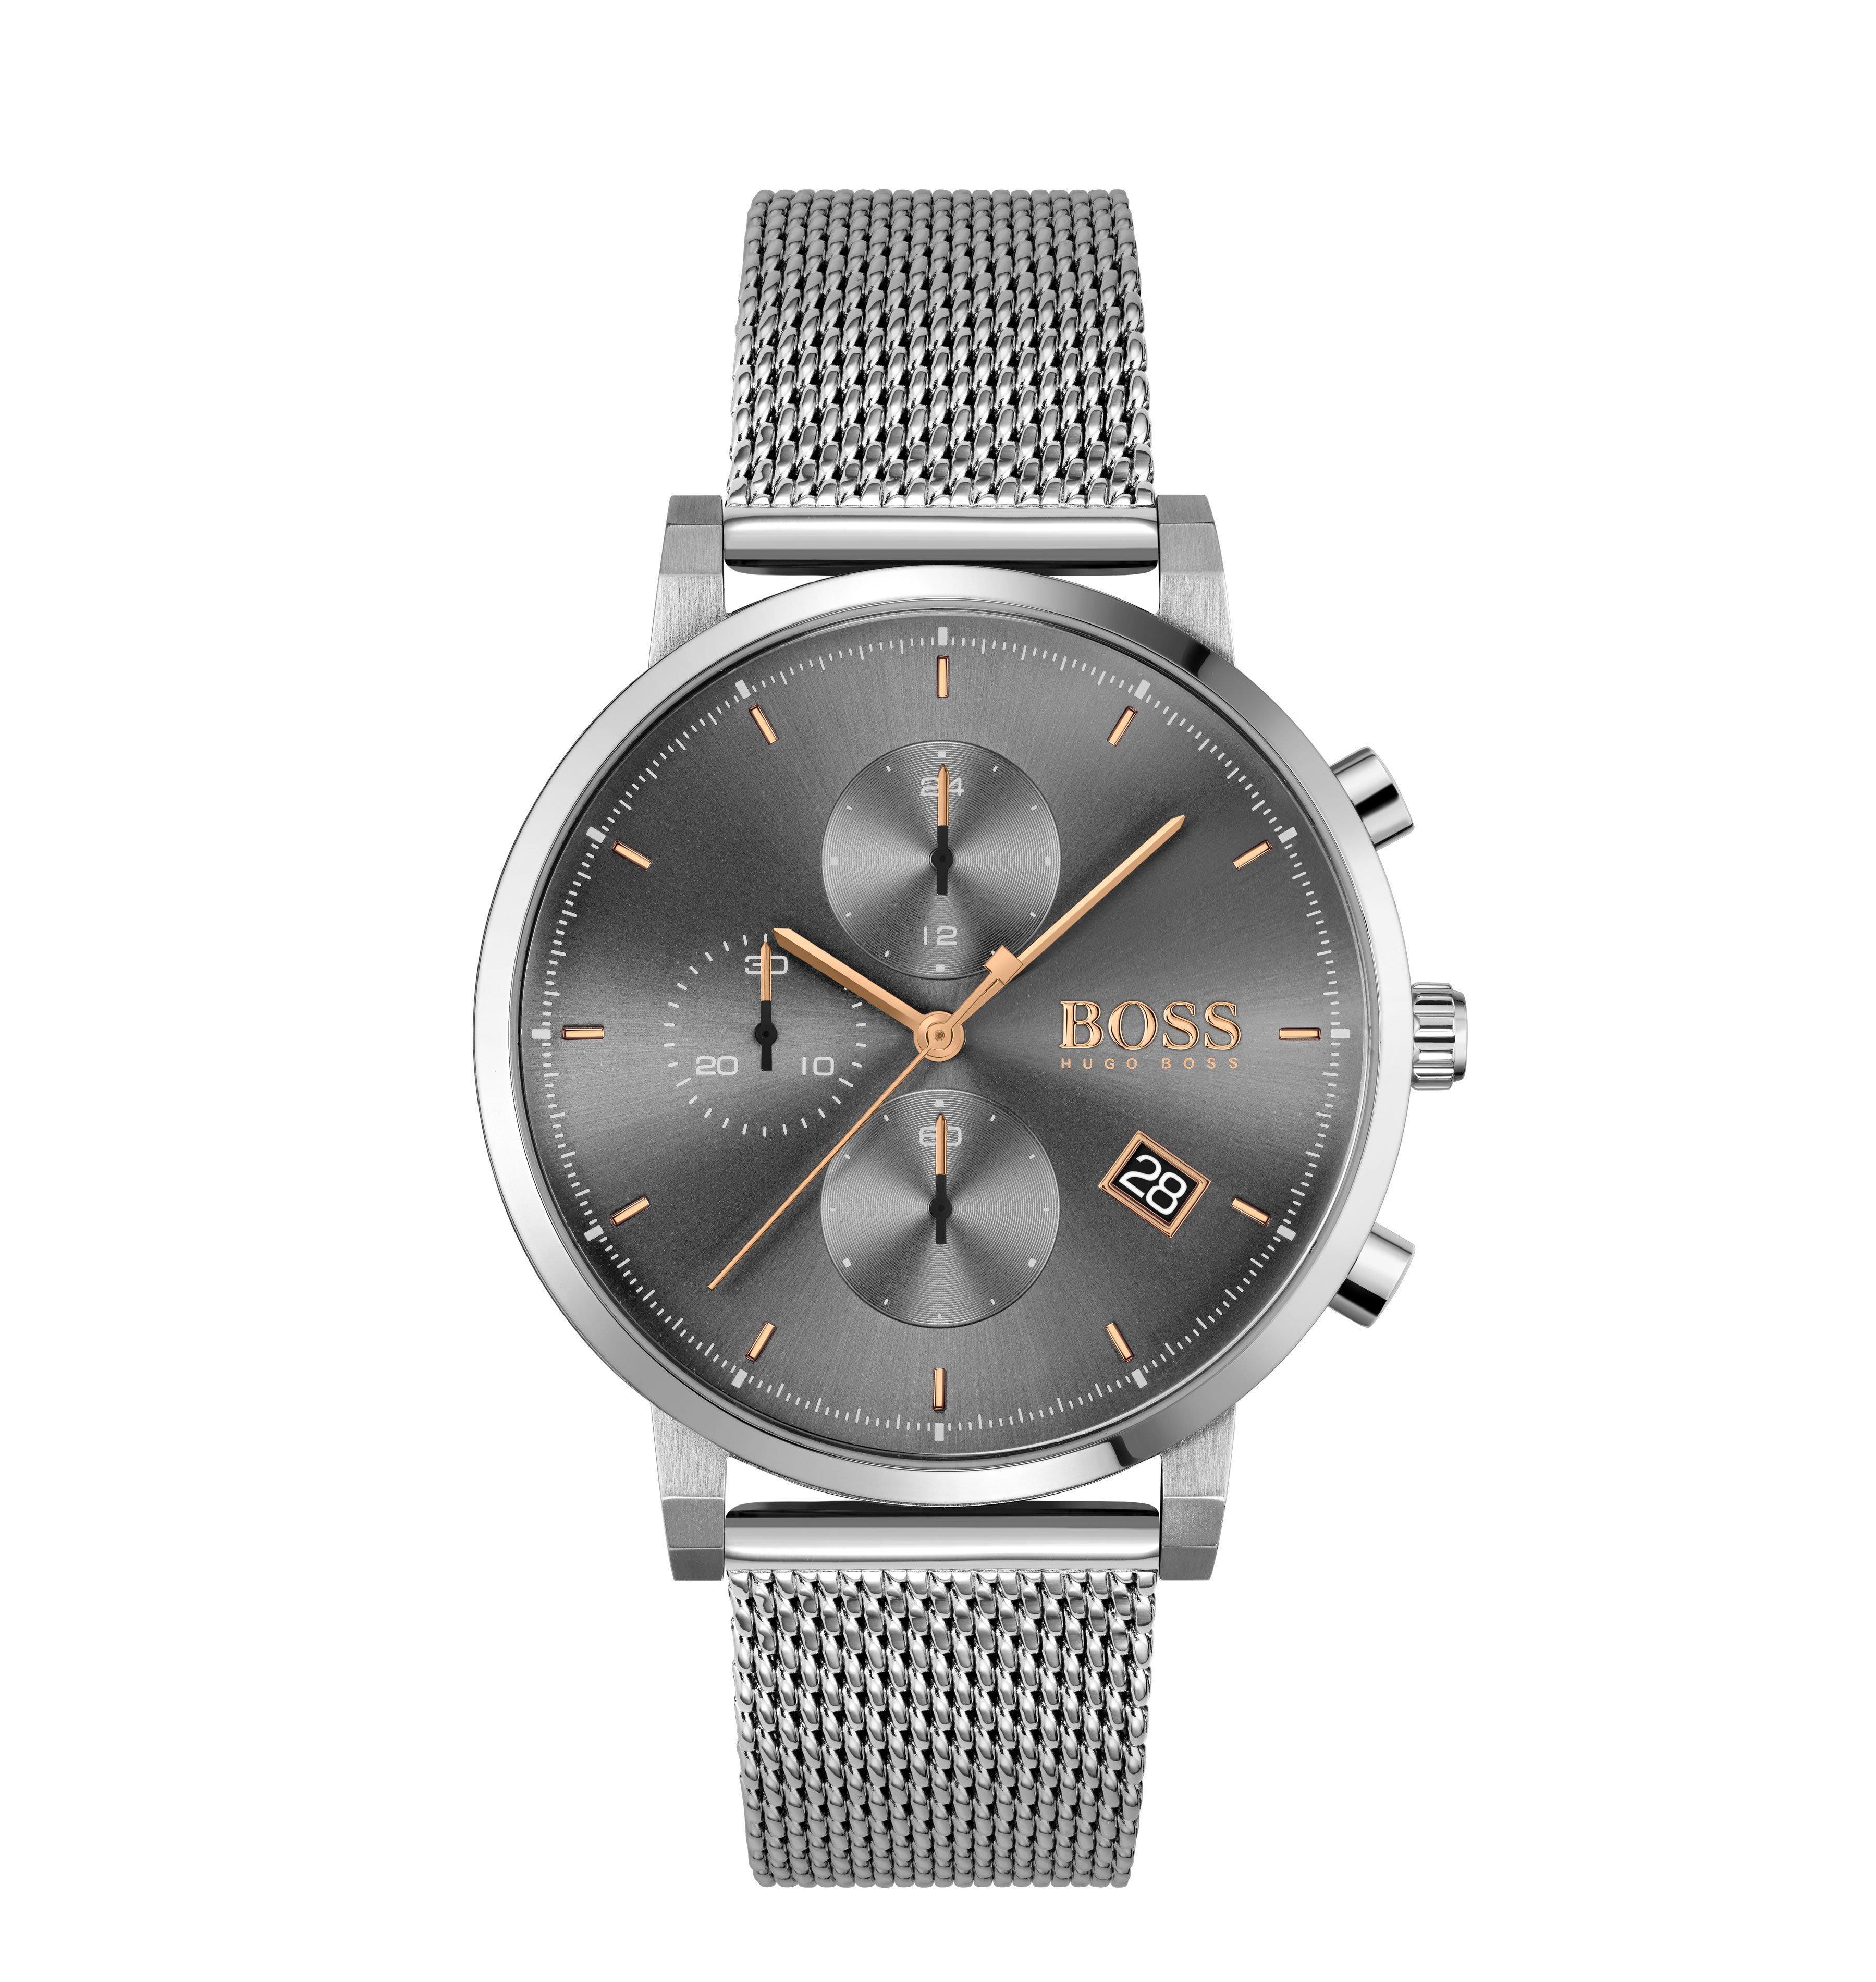 BOSS Integrity Chronograph Men's Watch